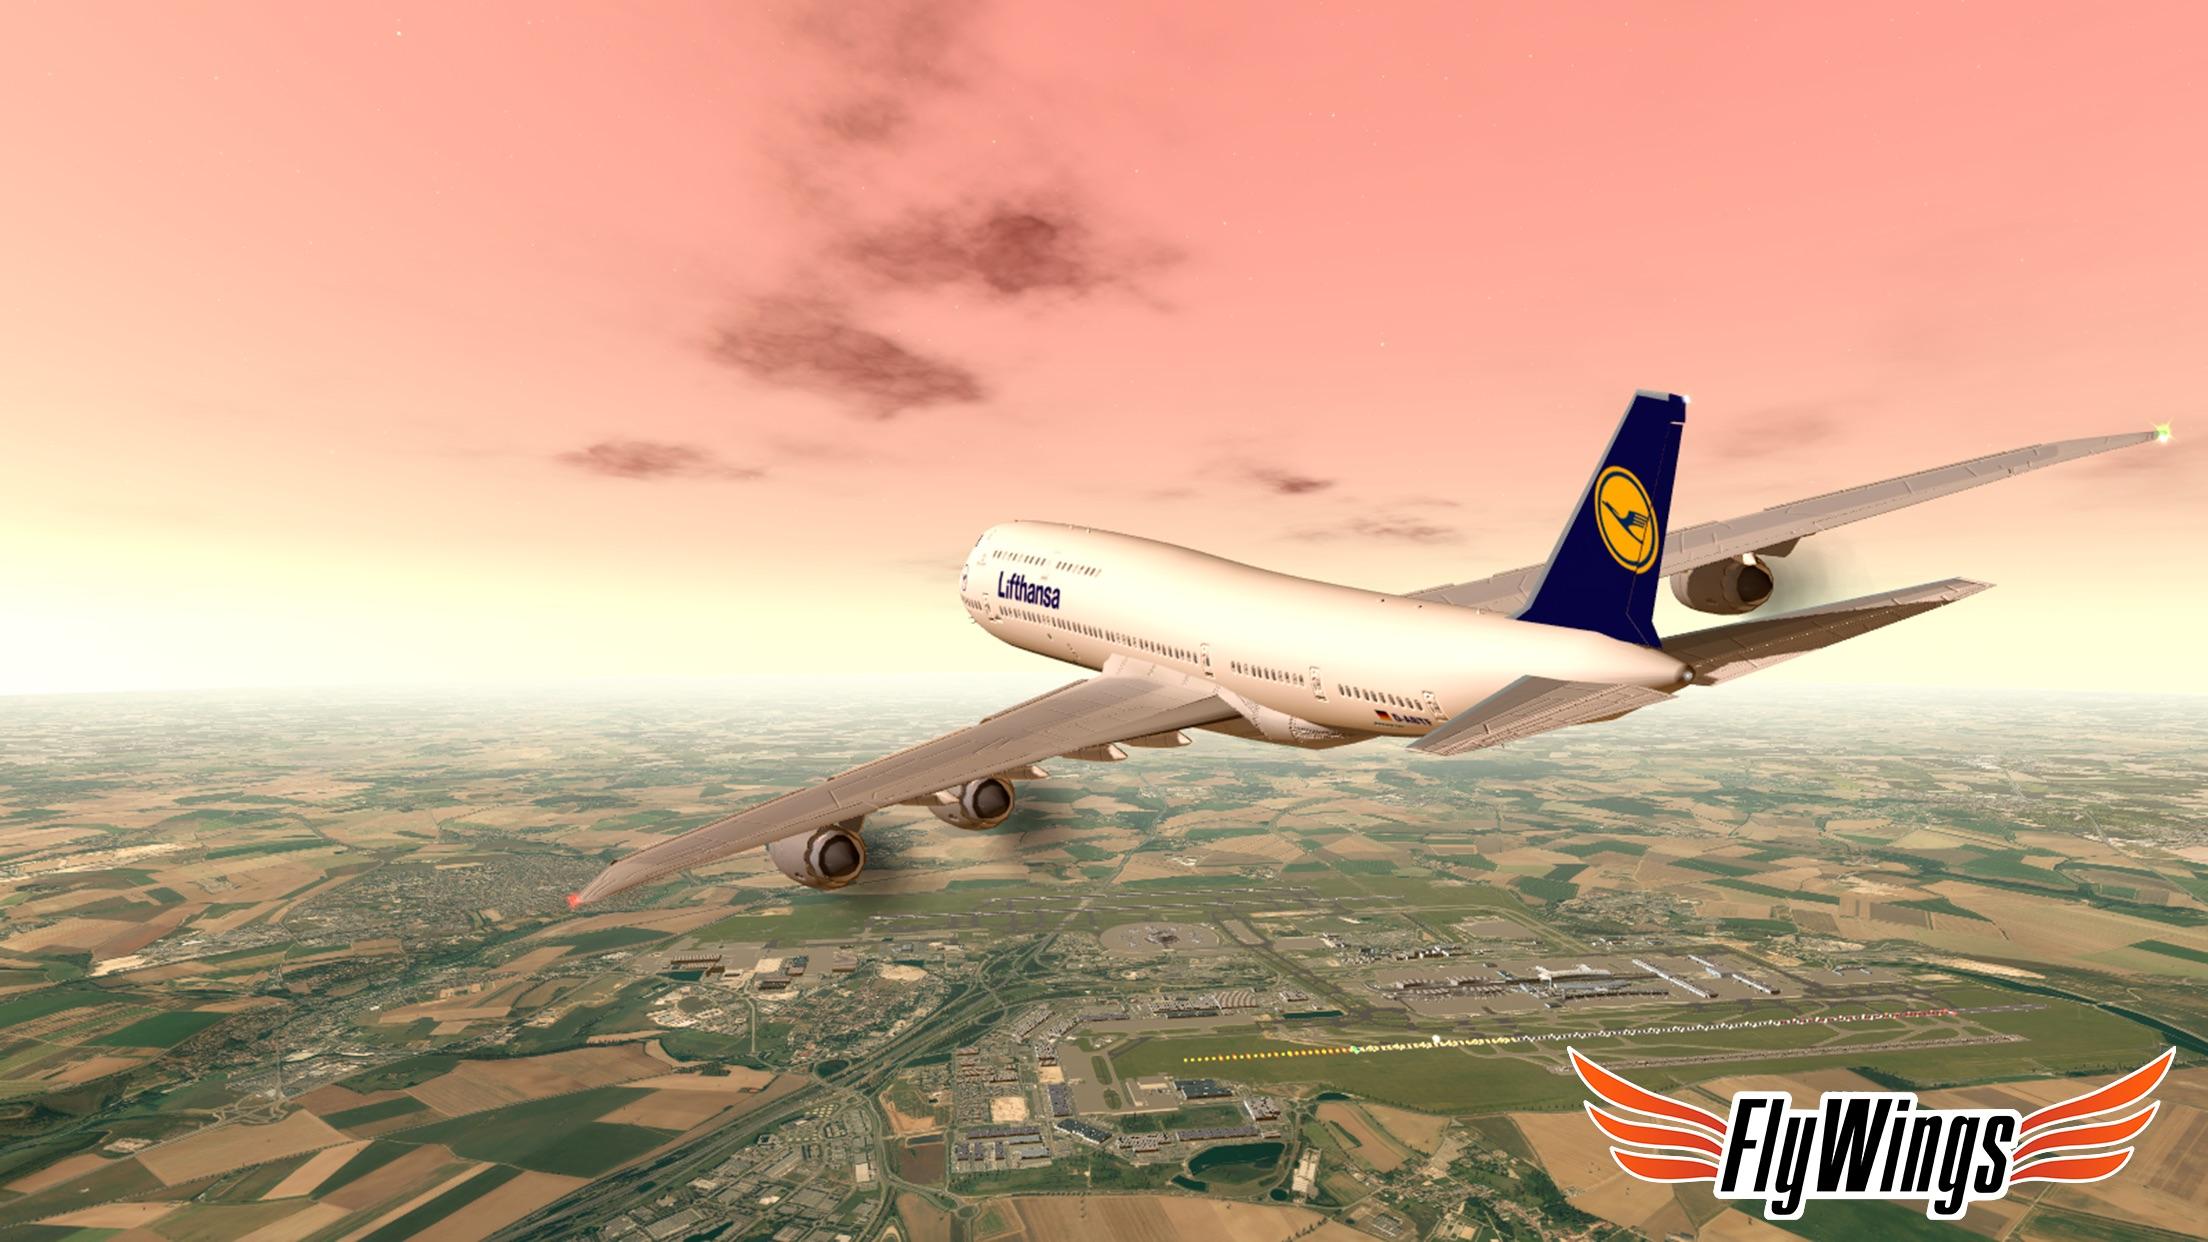 Flight Simulator Paris 2015 Online - FlyWings FREE TO PLAY Screenshot